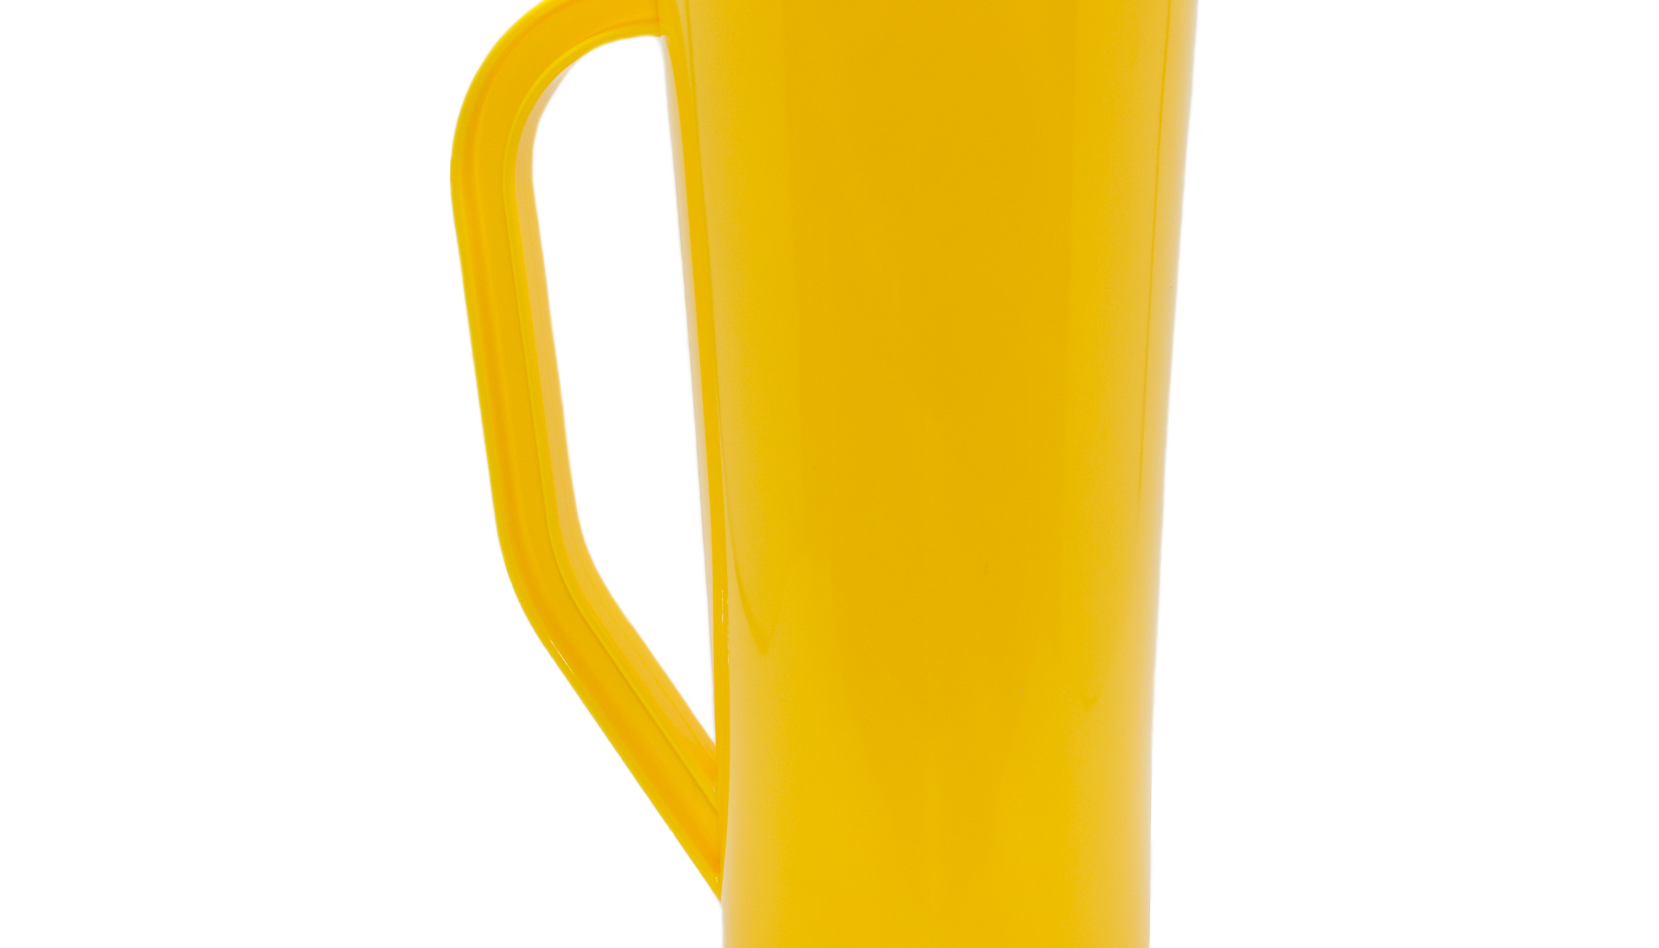 Amarelo L.png